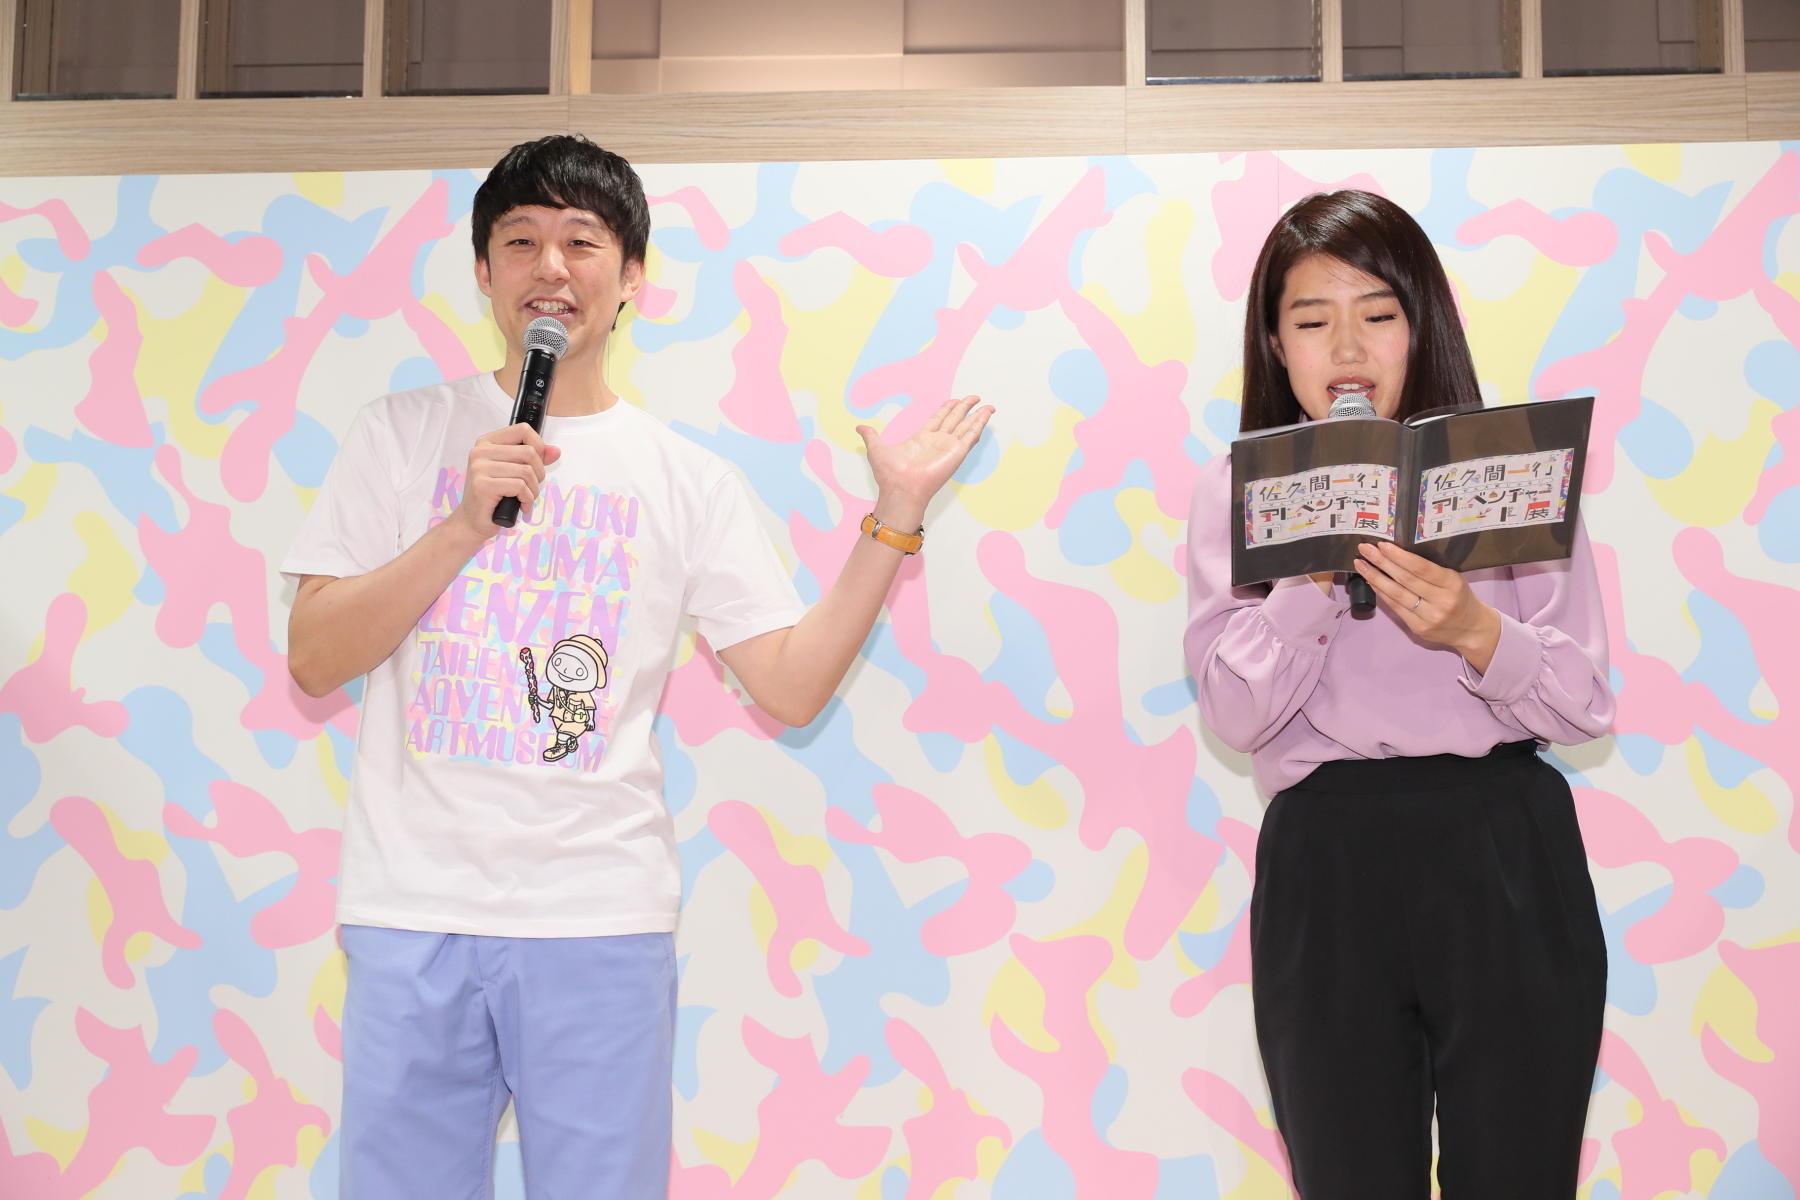 http://news.yoshimoto.co.jp/20180427001255-f523b5424587c84f65783dae614803f93b3b0095.jpg